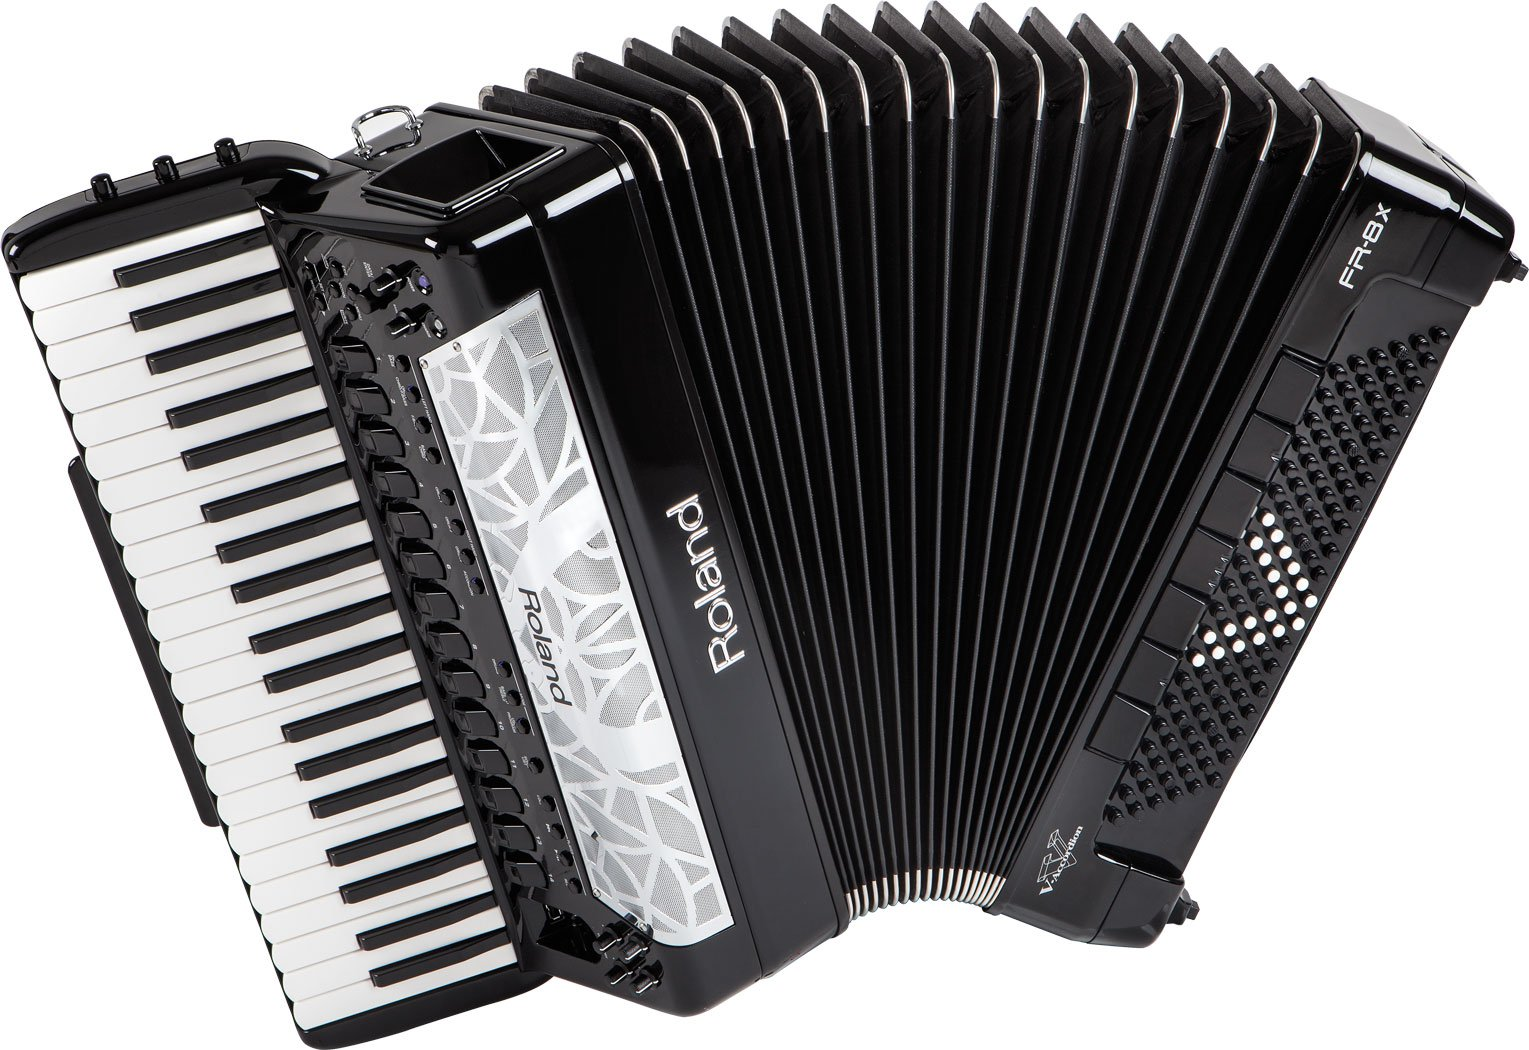 NEW Black Roland FR-8X-BK Digital Piano Accordion 41 120